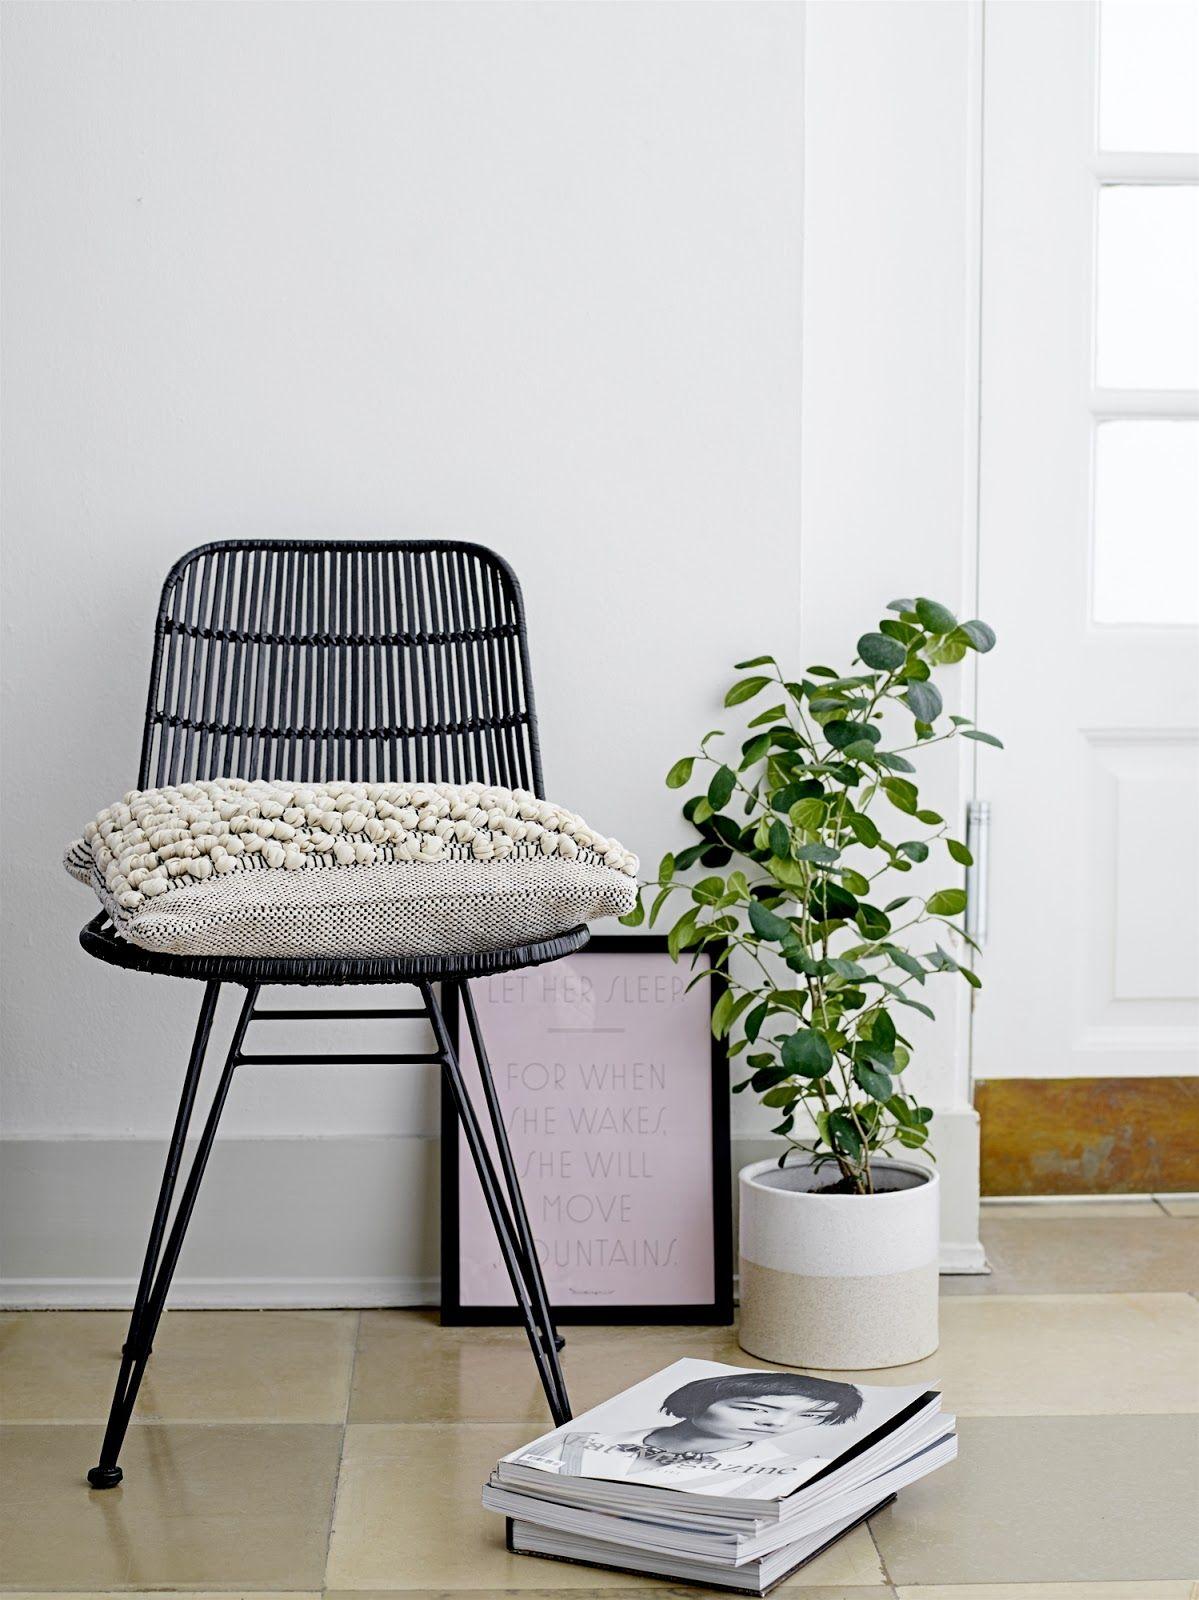 bloomingville verliebt in rattan makramee planter im skandi style - Skandinavische Design Sthle